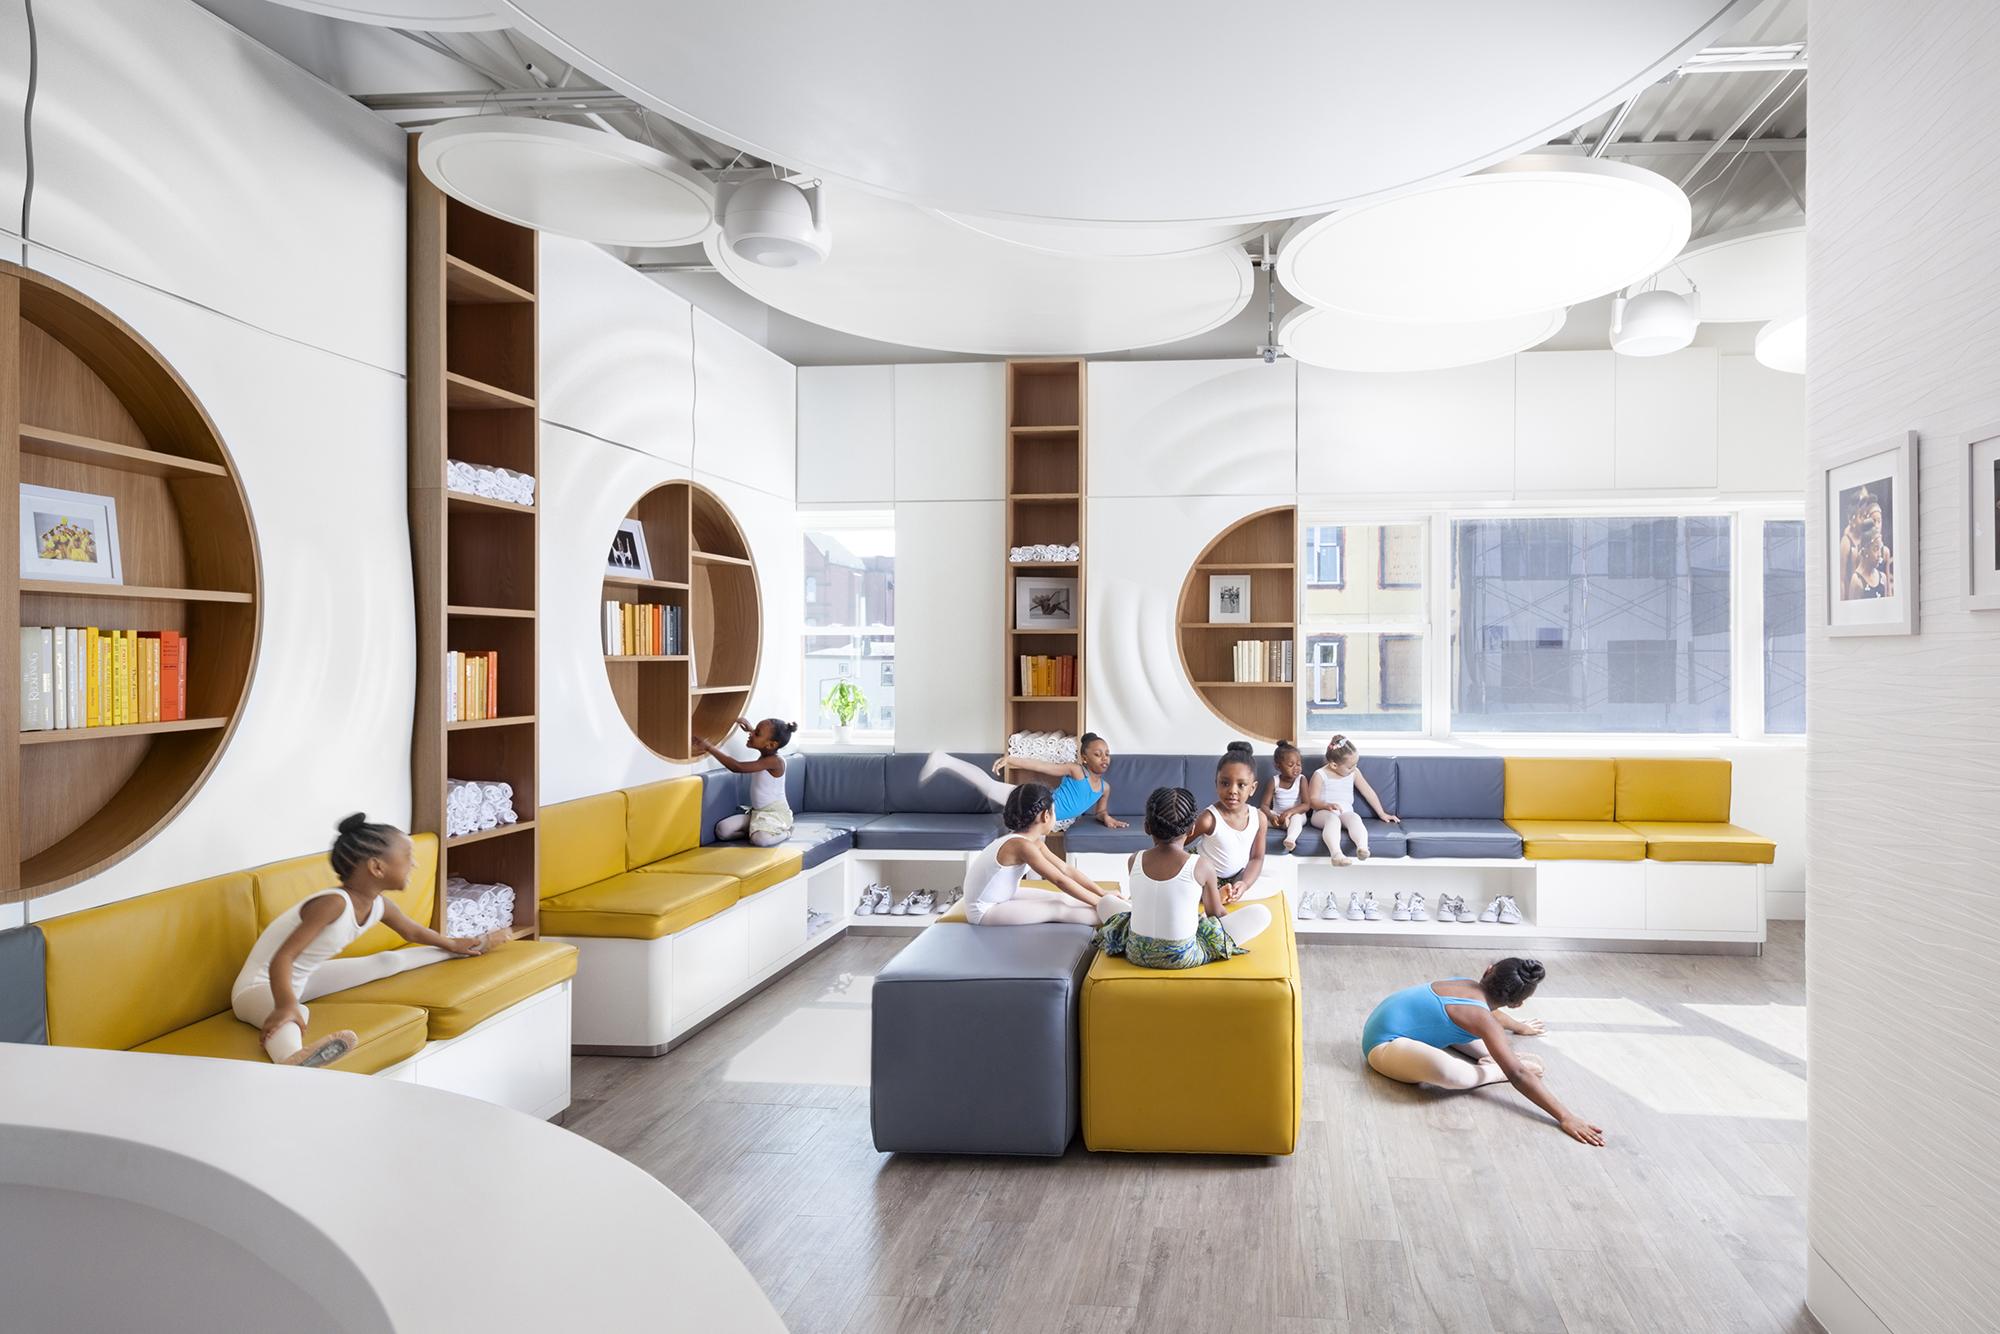 aia new york announces 2017 design awards architect